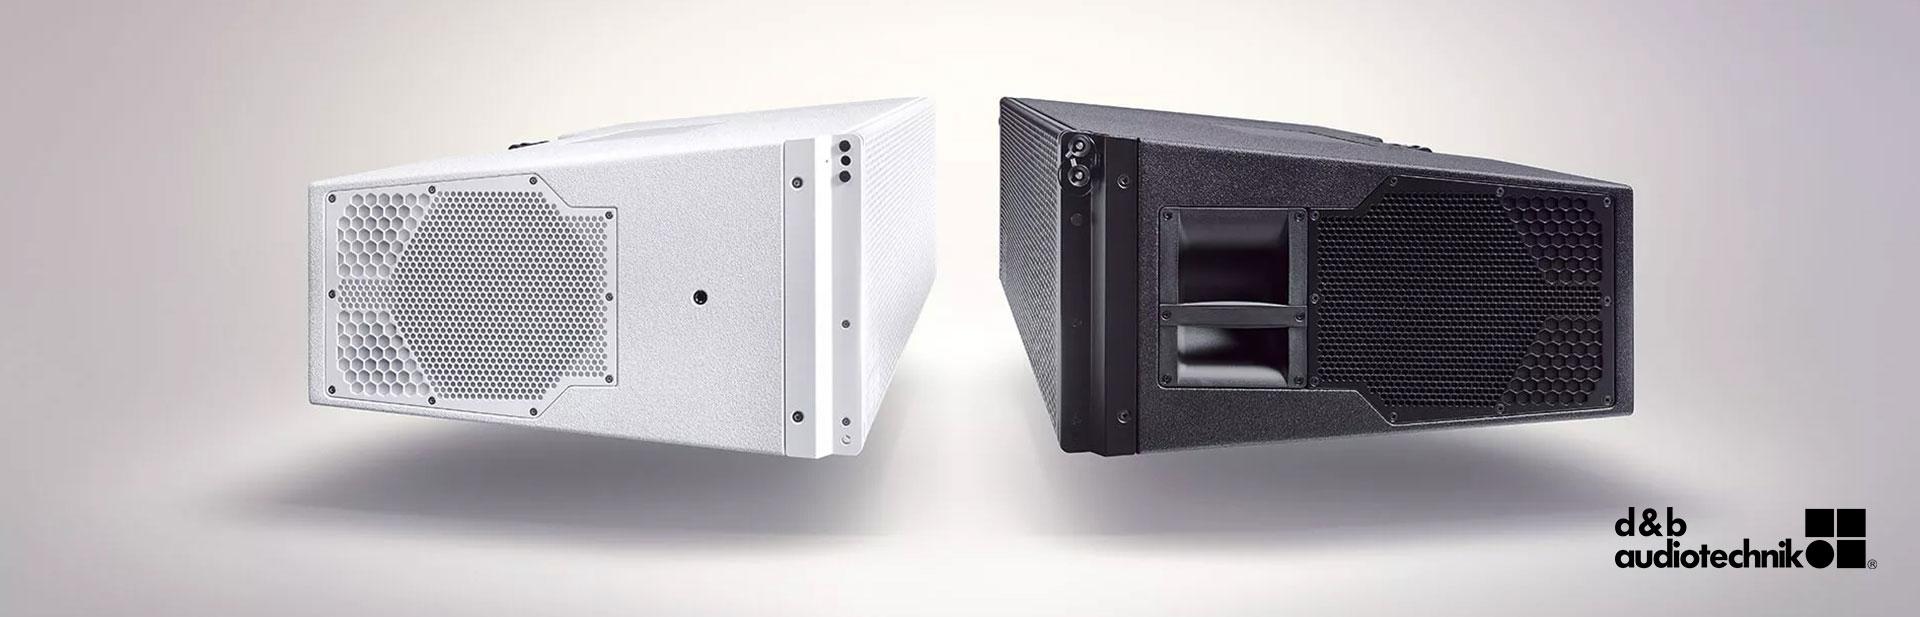 Stage Audio Works - d&b KSLi System